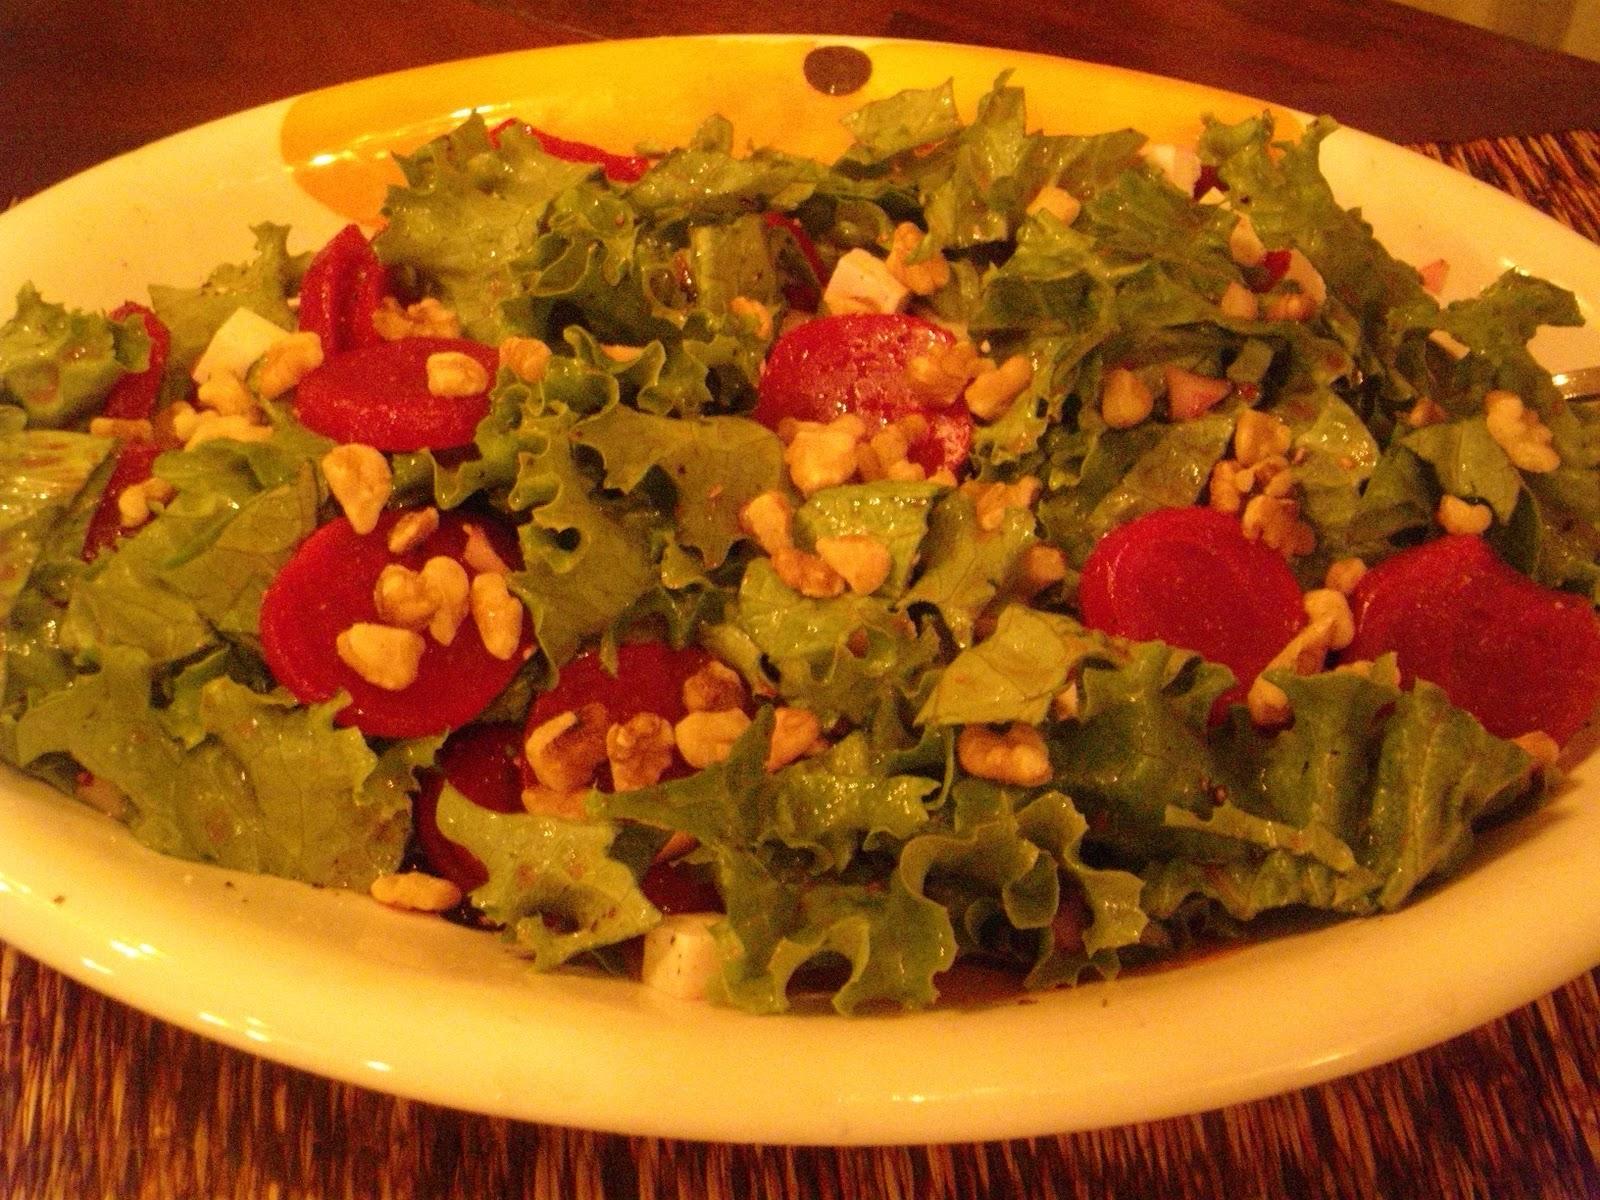 Gluten Free~Huge Taste: Beet and Ricotta Salata Salad